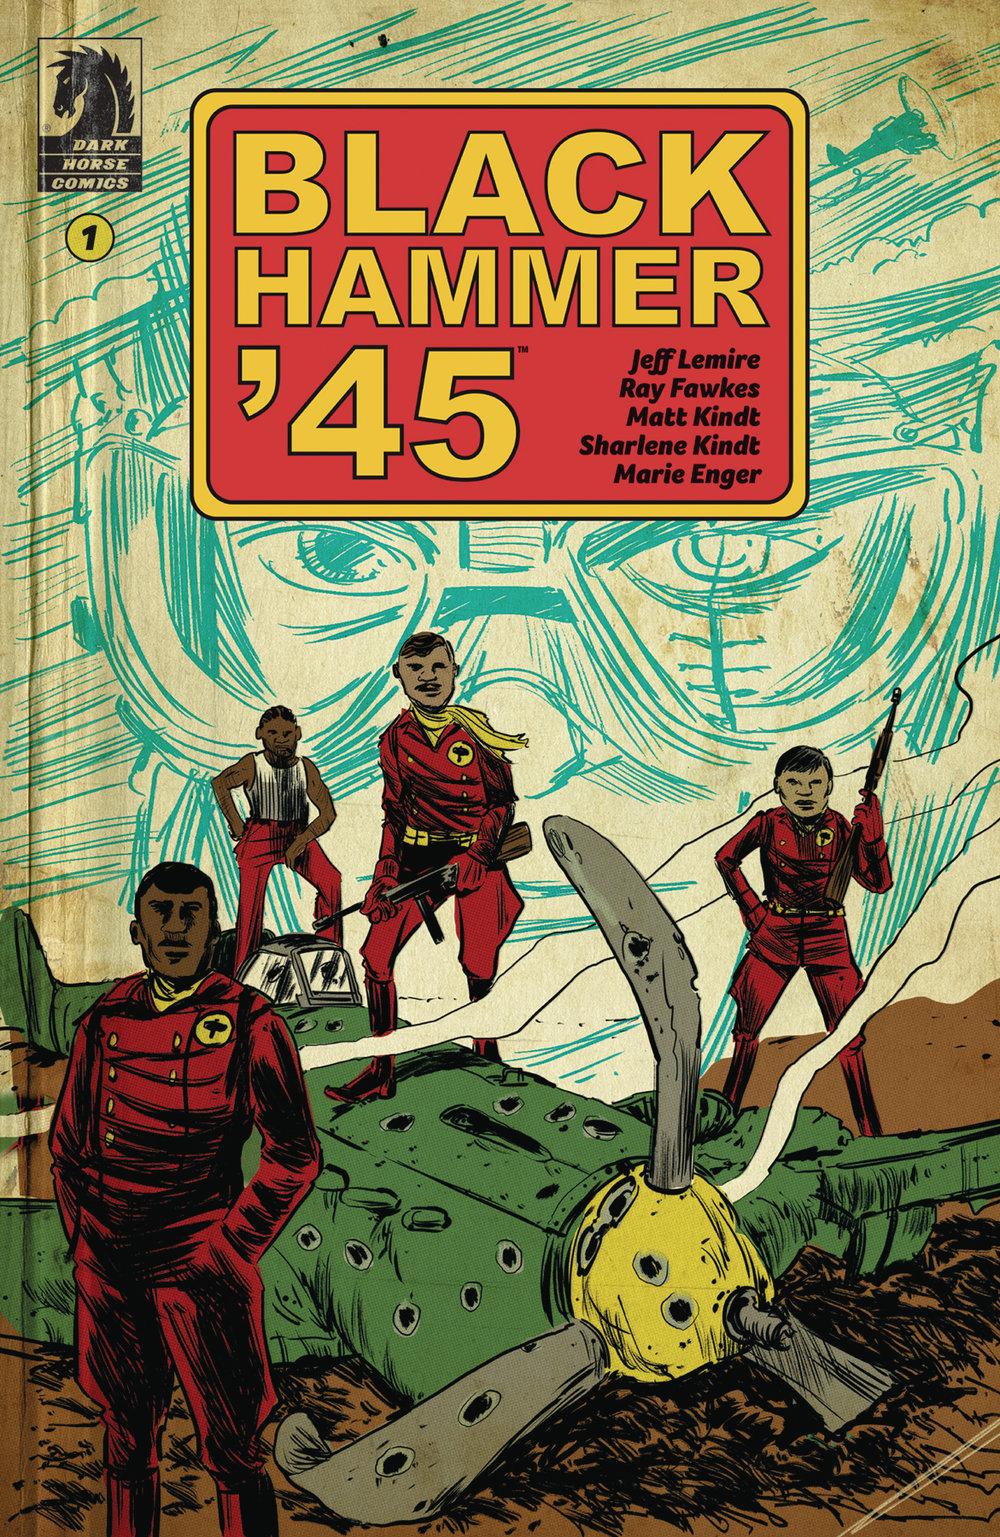 Black Hammer '45.jpg